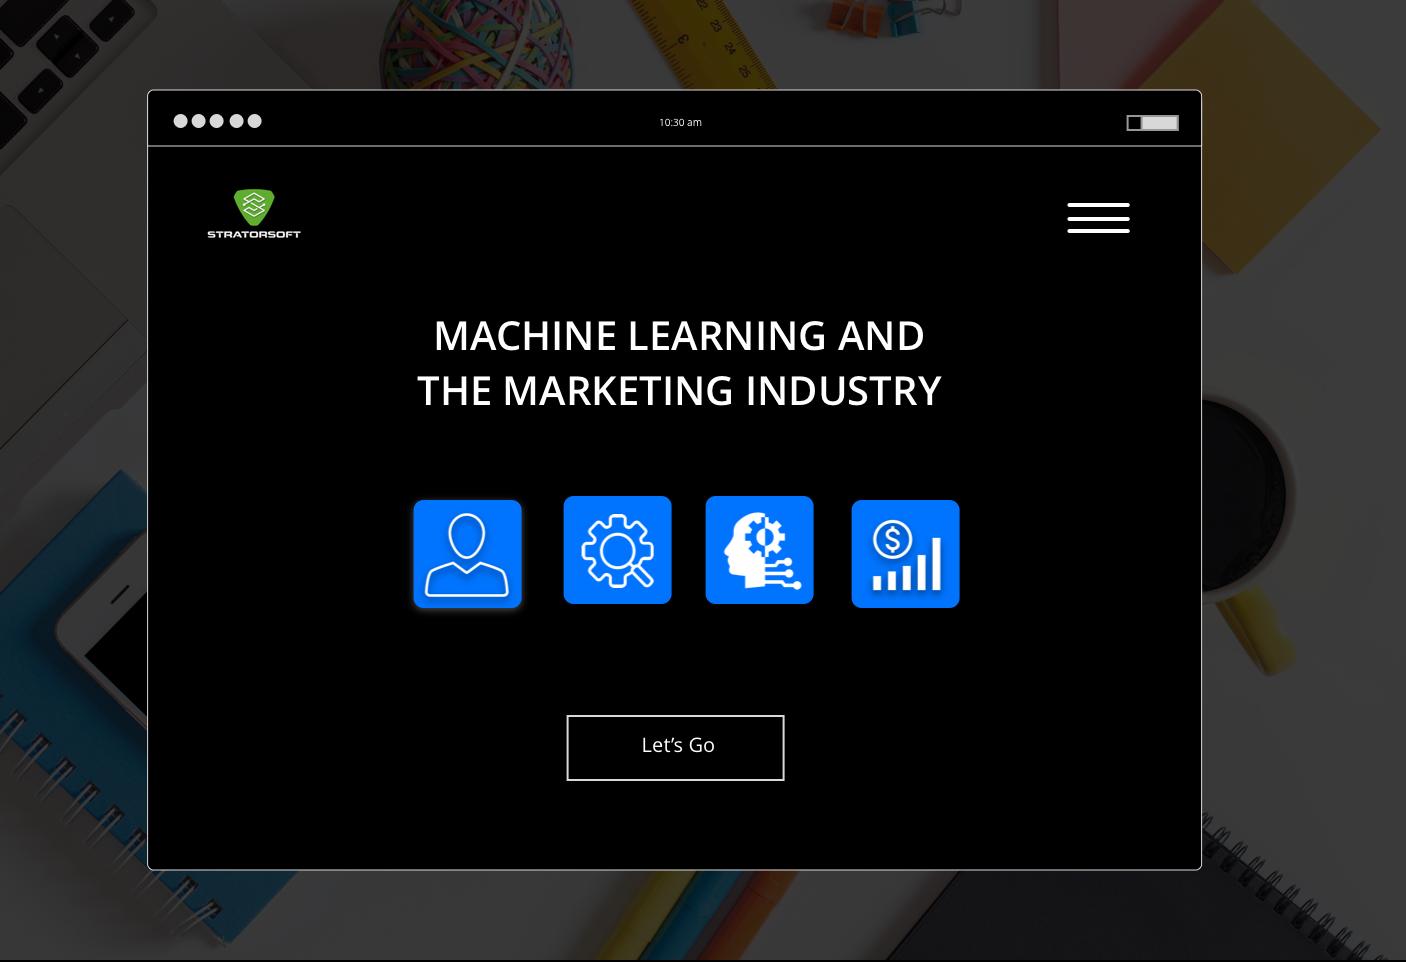 Machine Learning and Marketing image